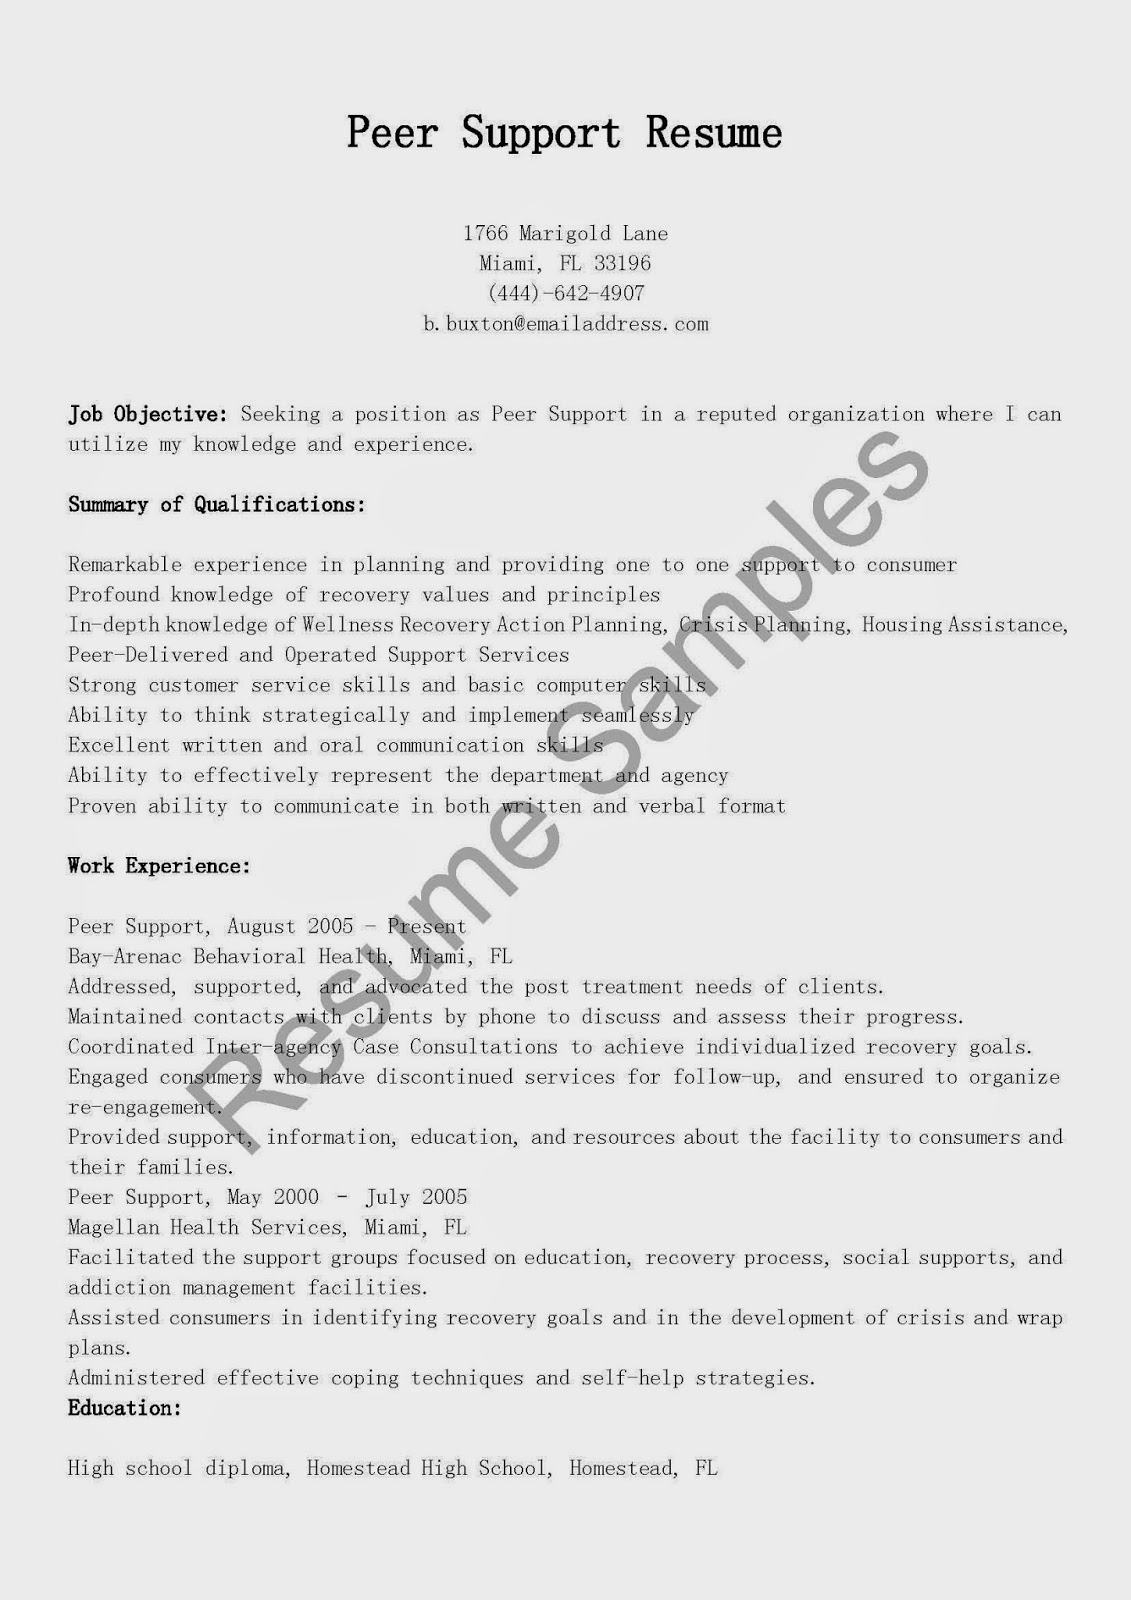 resume samples peer support resume sample